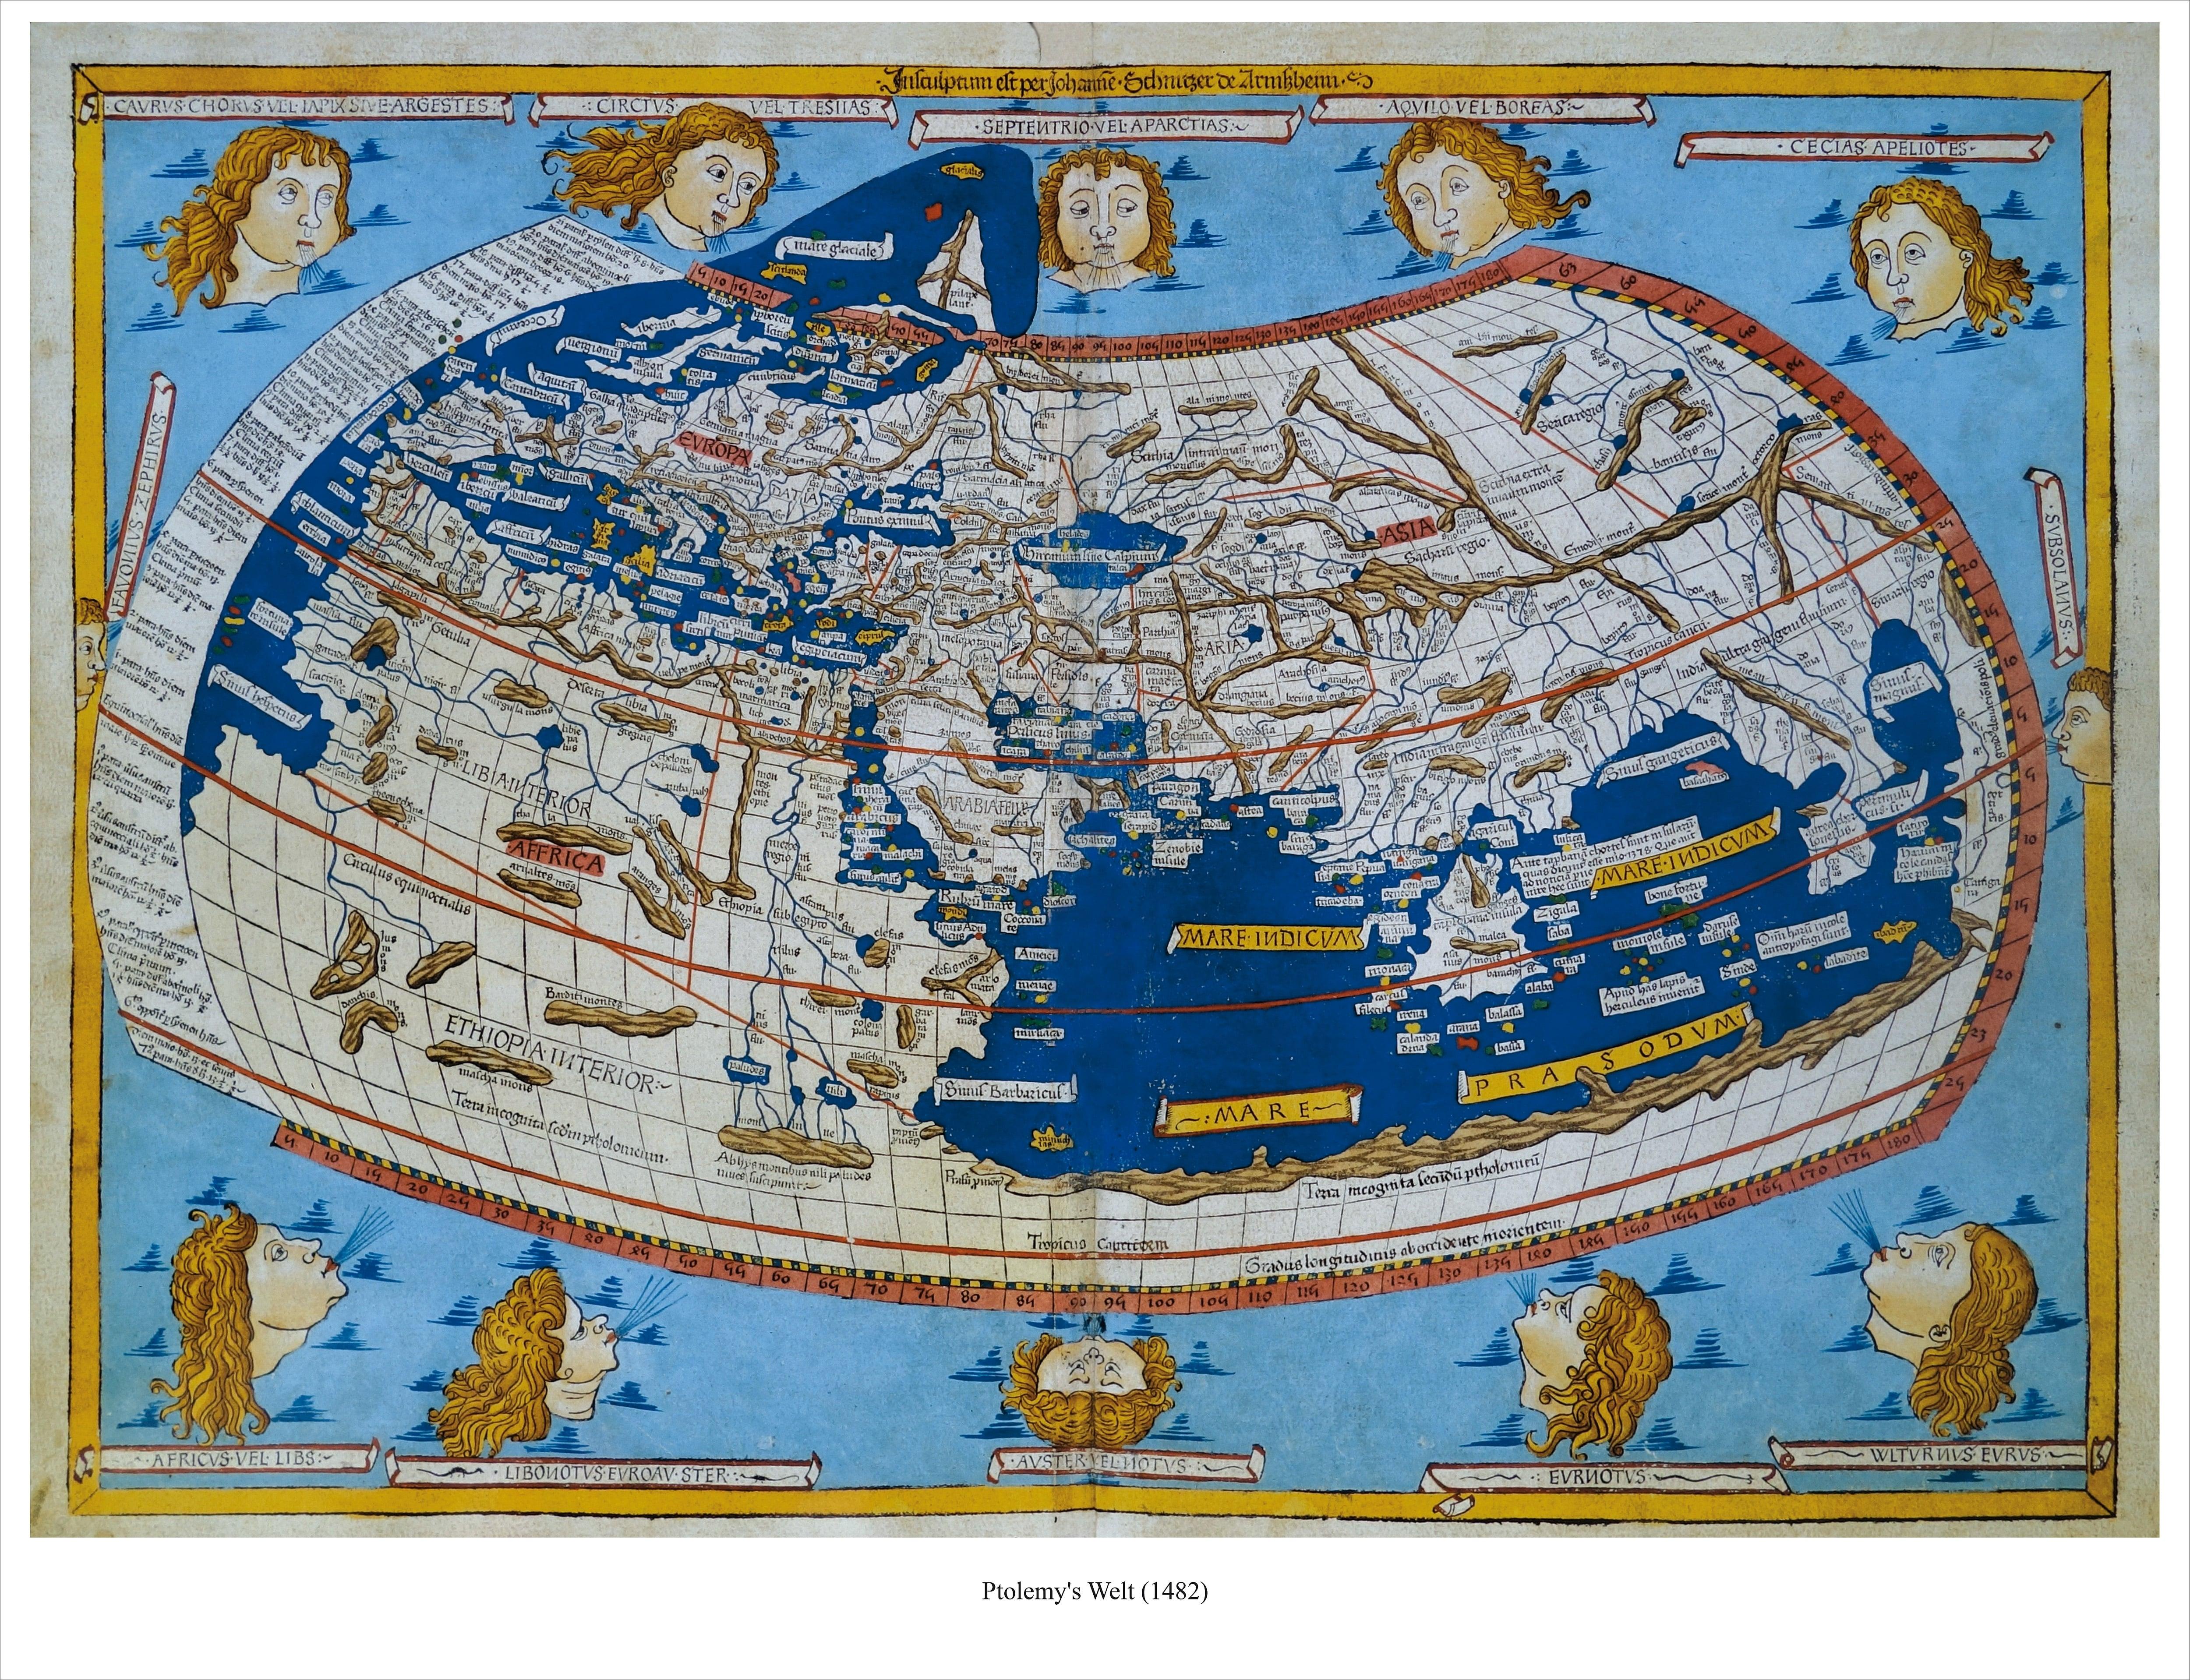 Ptolemy S World 1482 71 X 56cm Antique Maps Wall Maps